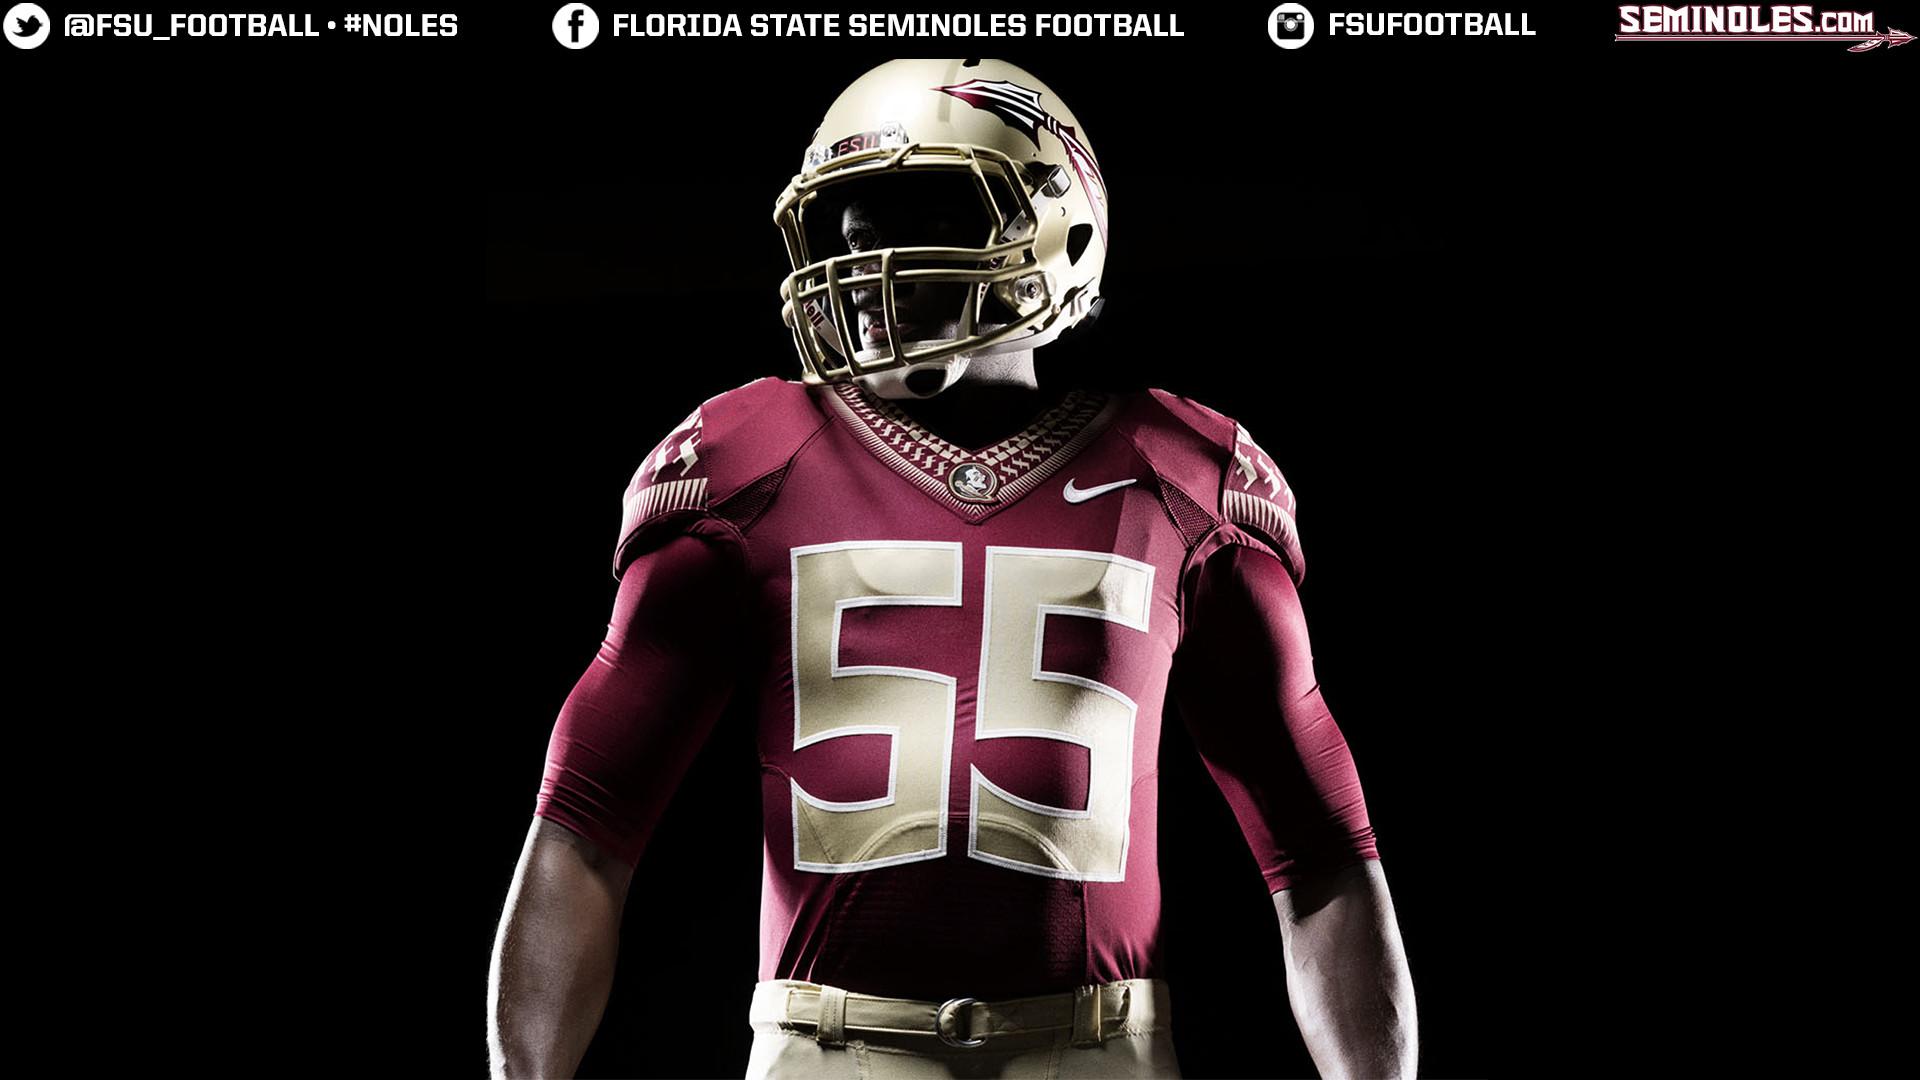 Florida State Football Wallpaper